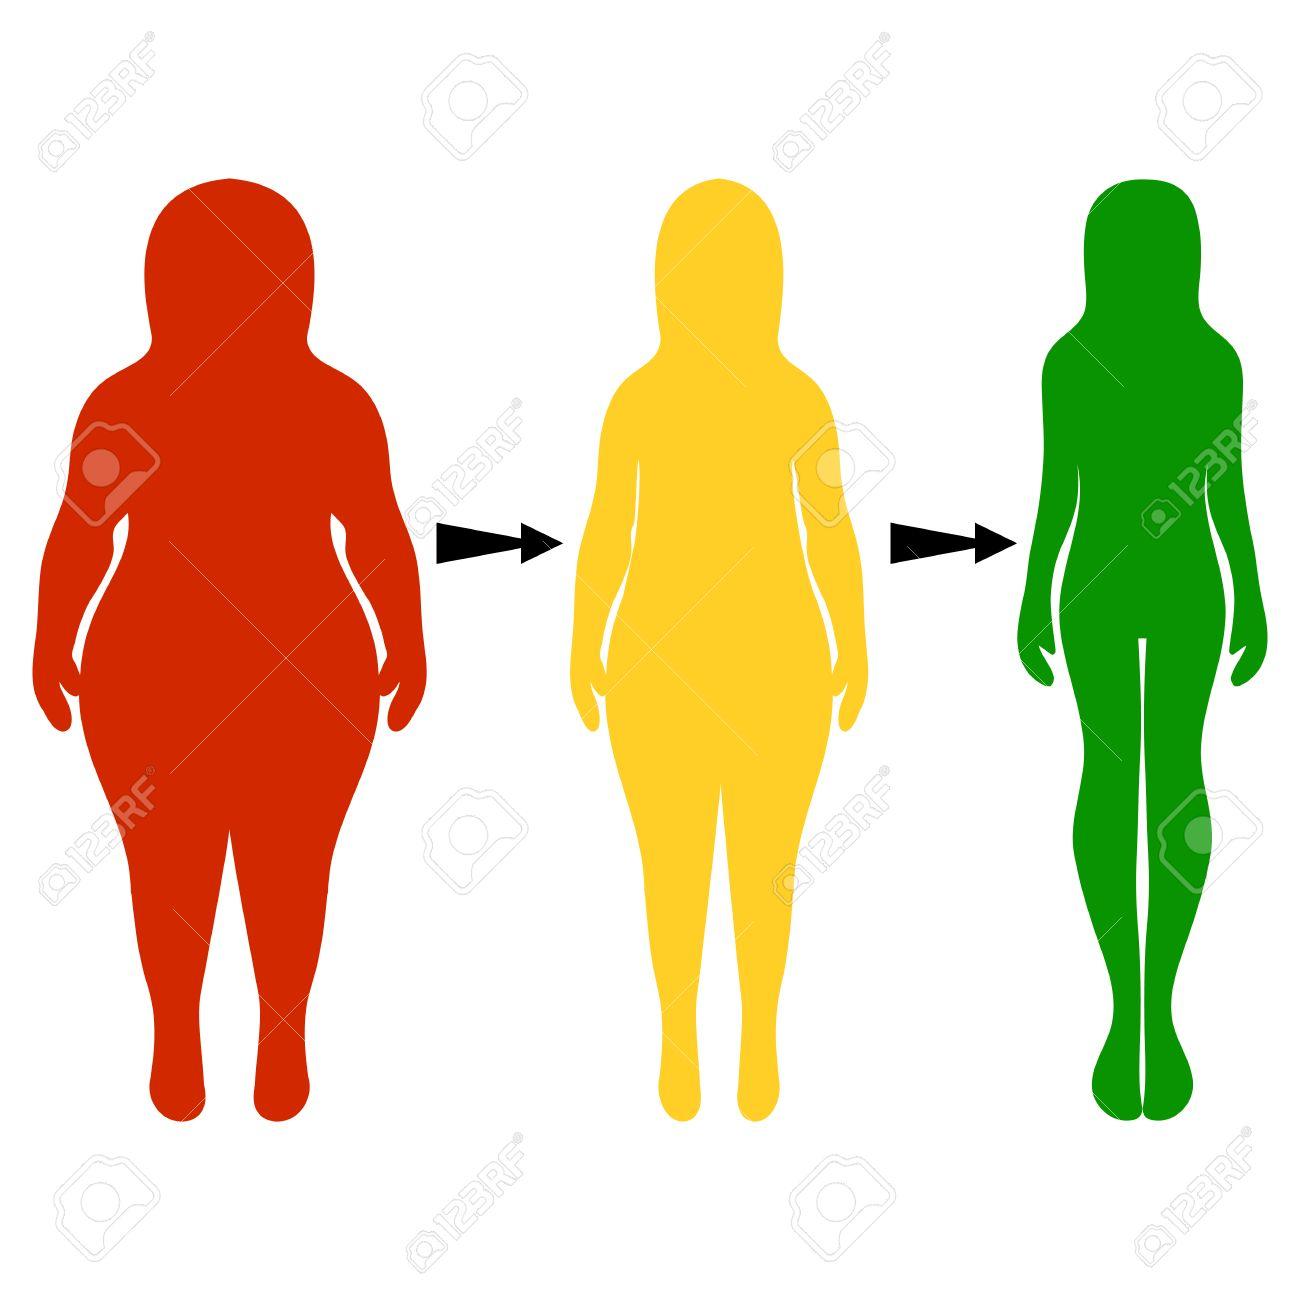 Penis zu dünn